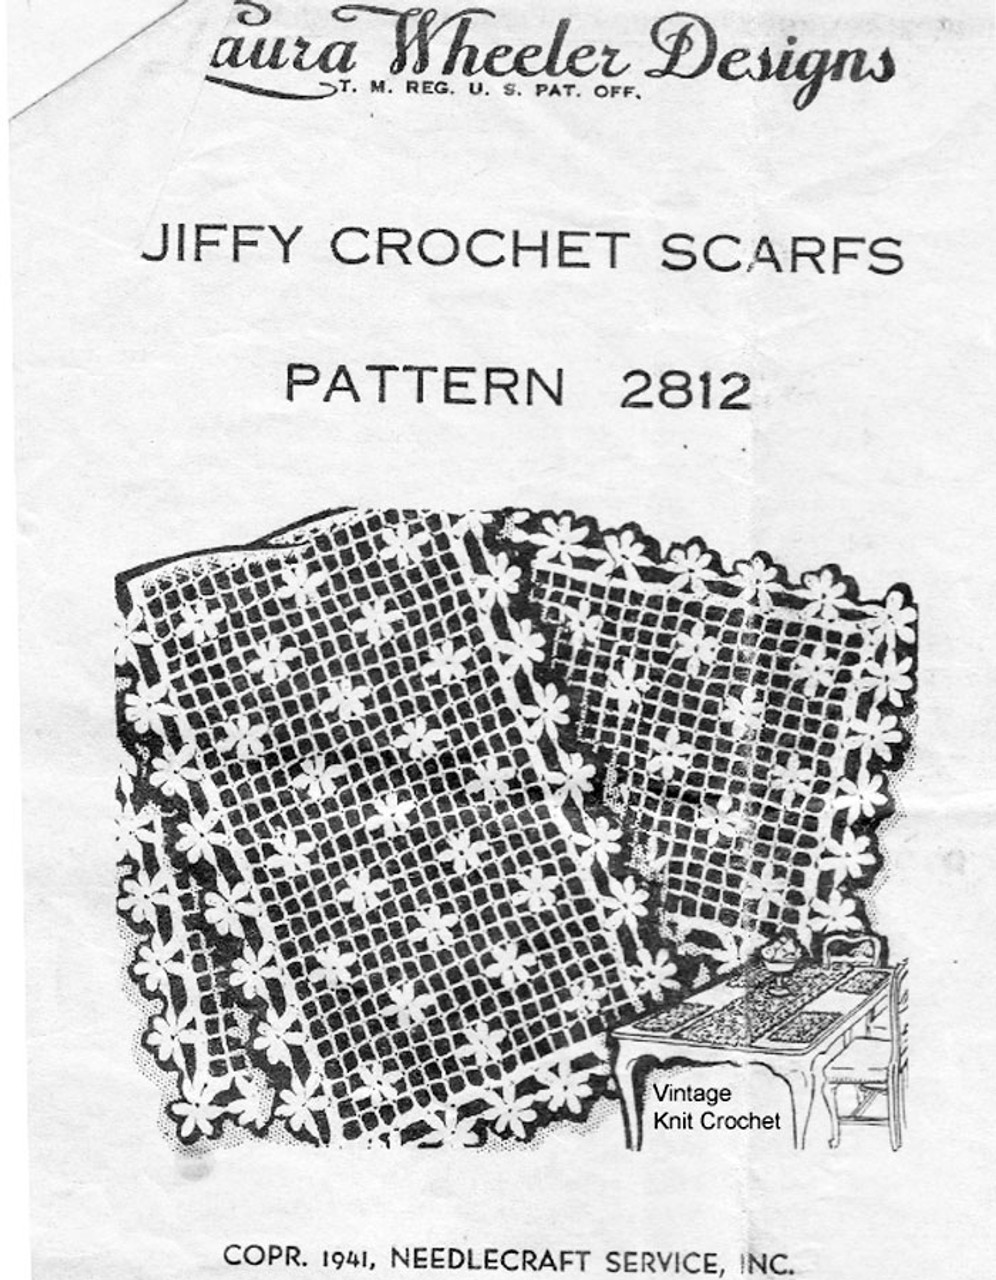 Crochet Daisy Runner Pattern, Laura Wheeler 2812